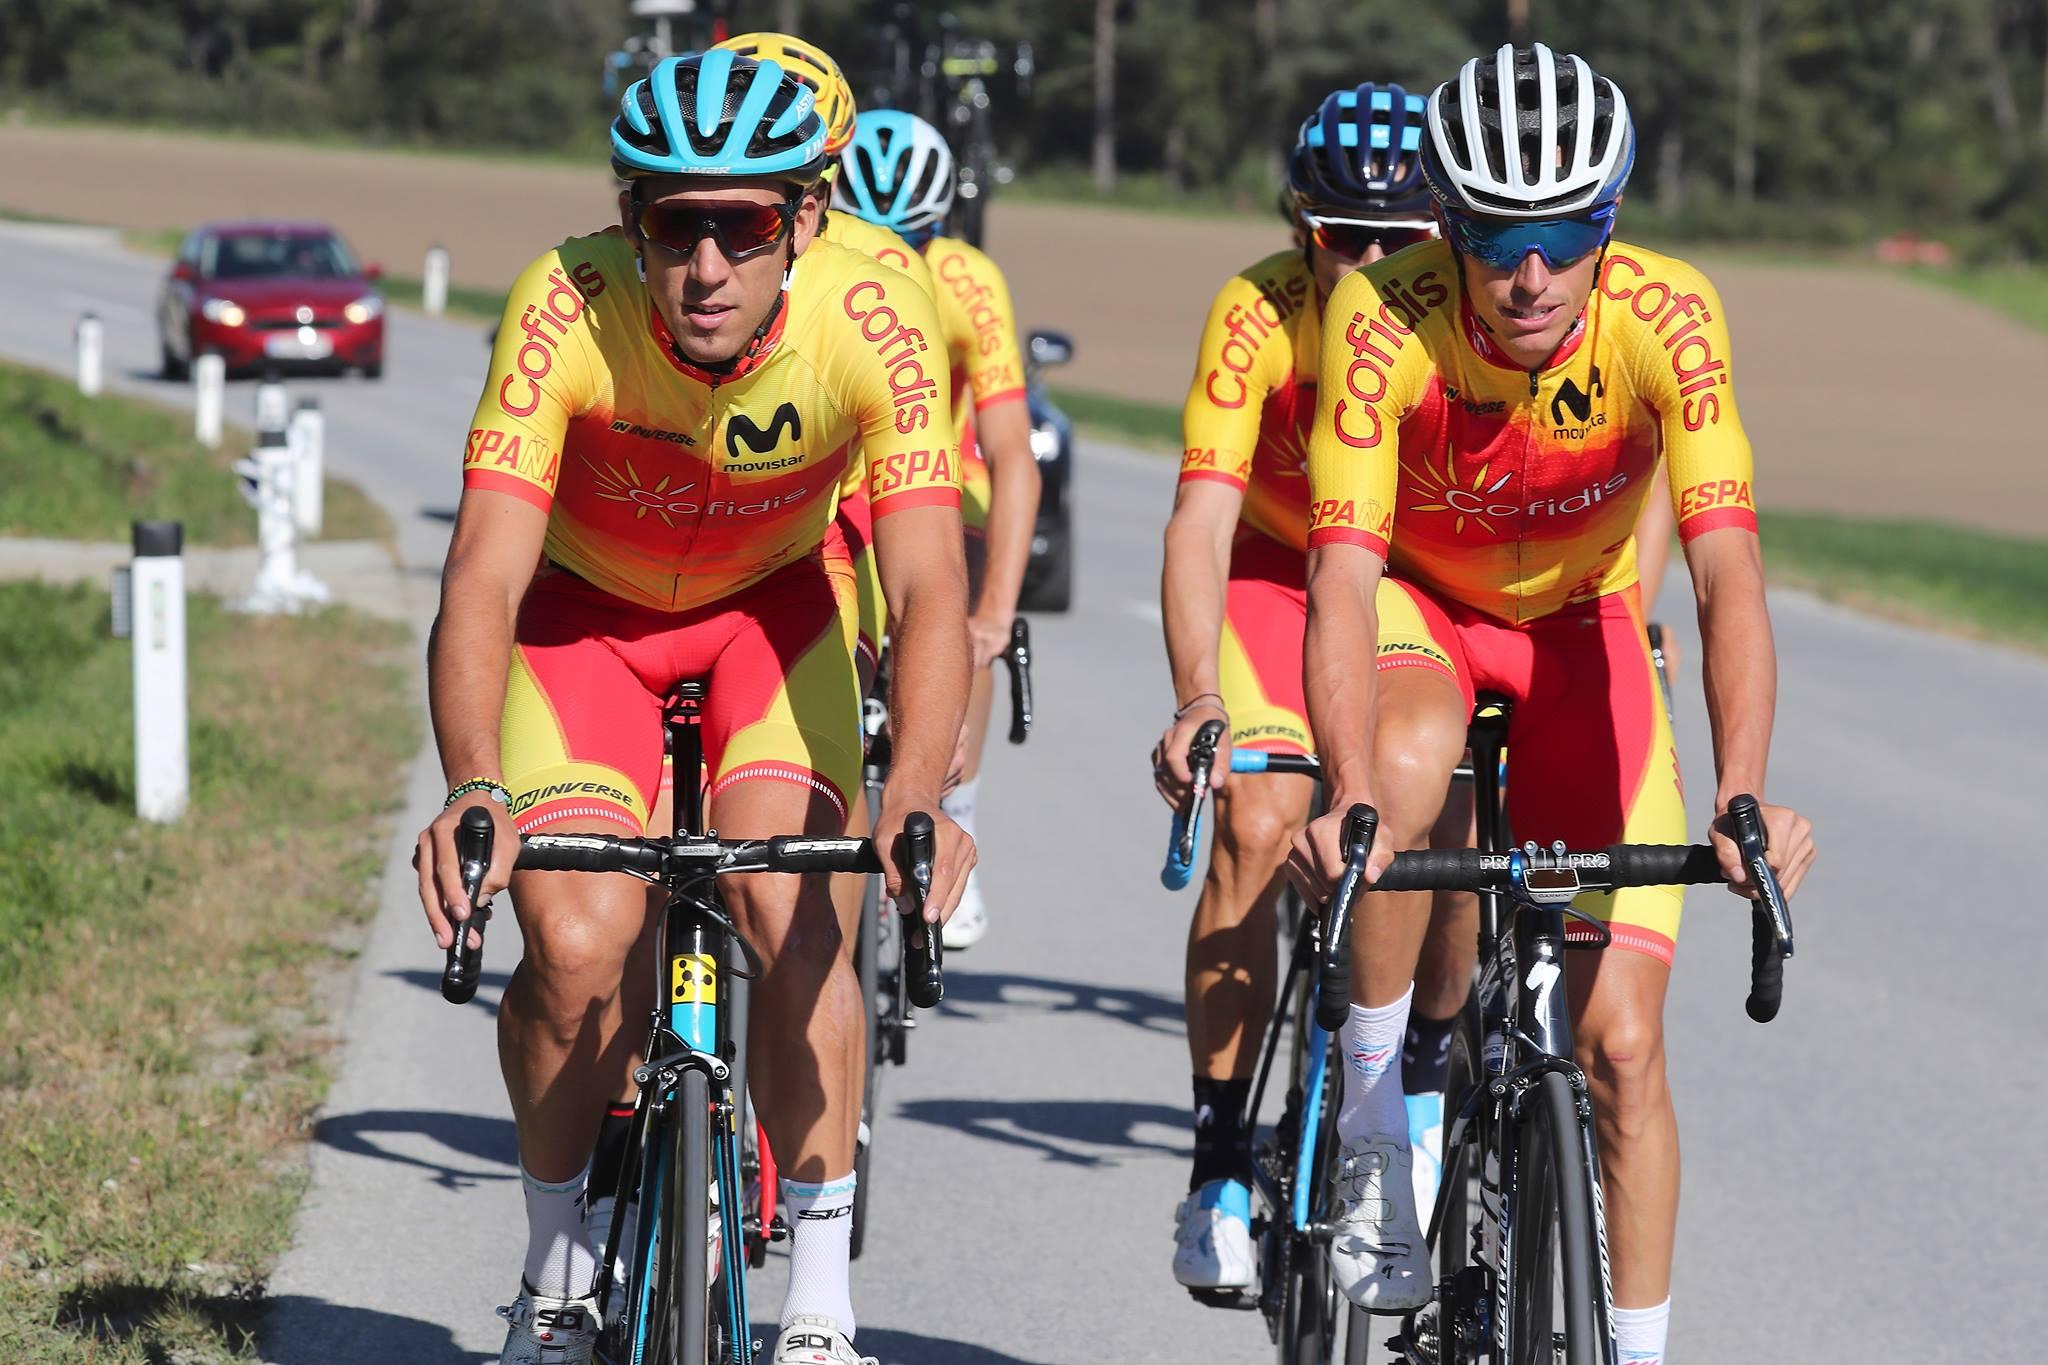 #TeamESPCiclismo / Campeonato del Mundo de Carretera / Innsbruck